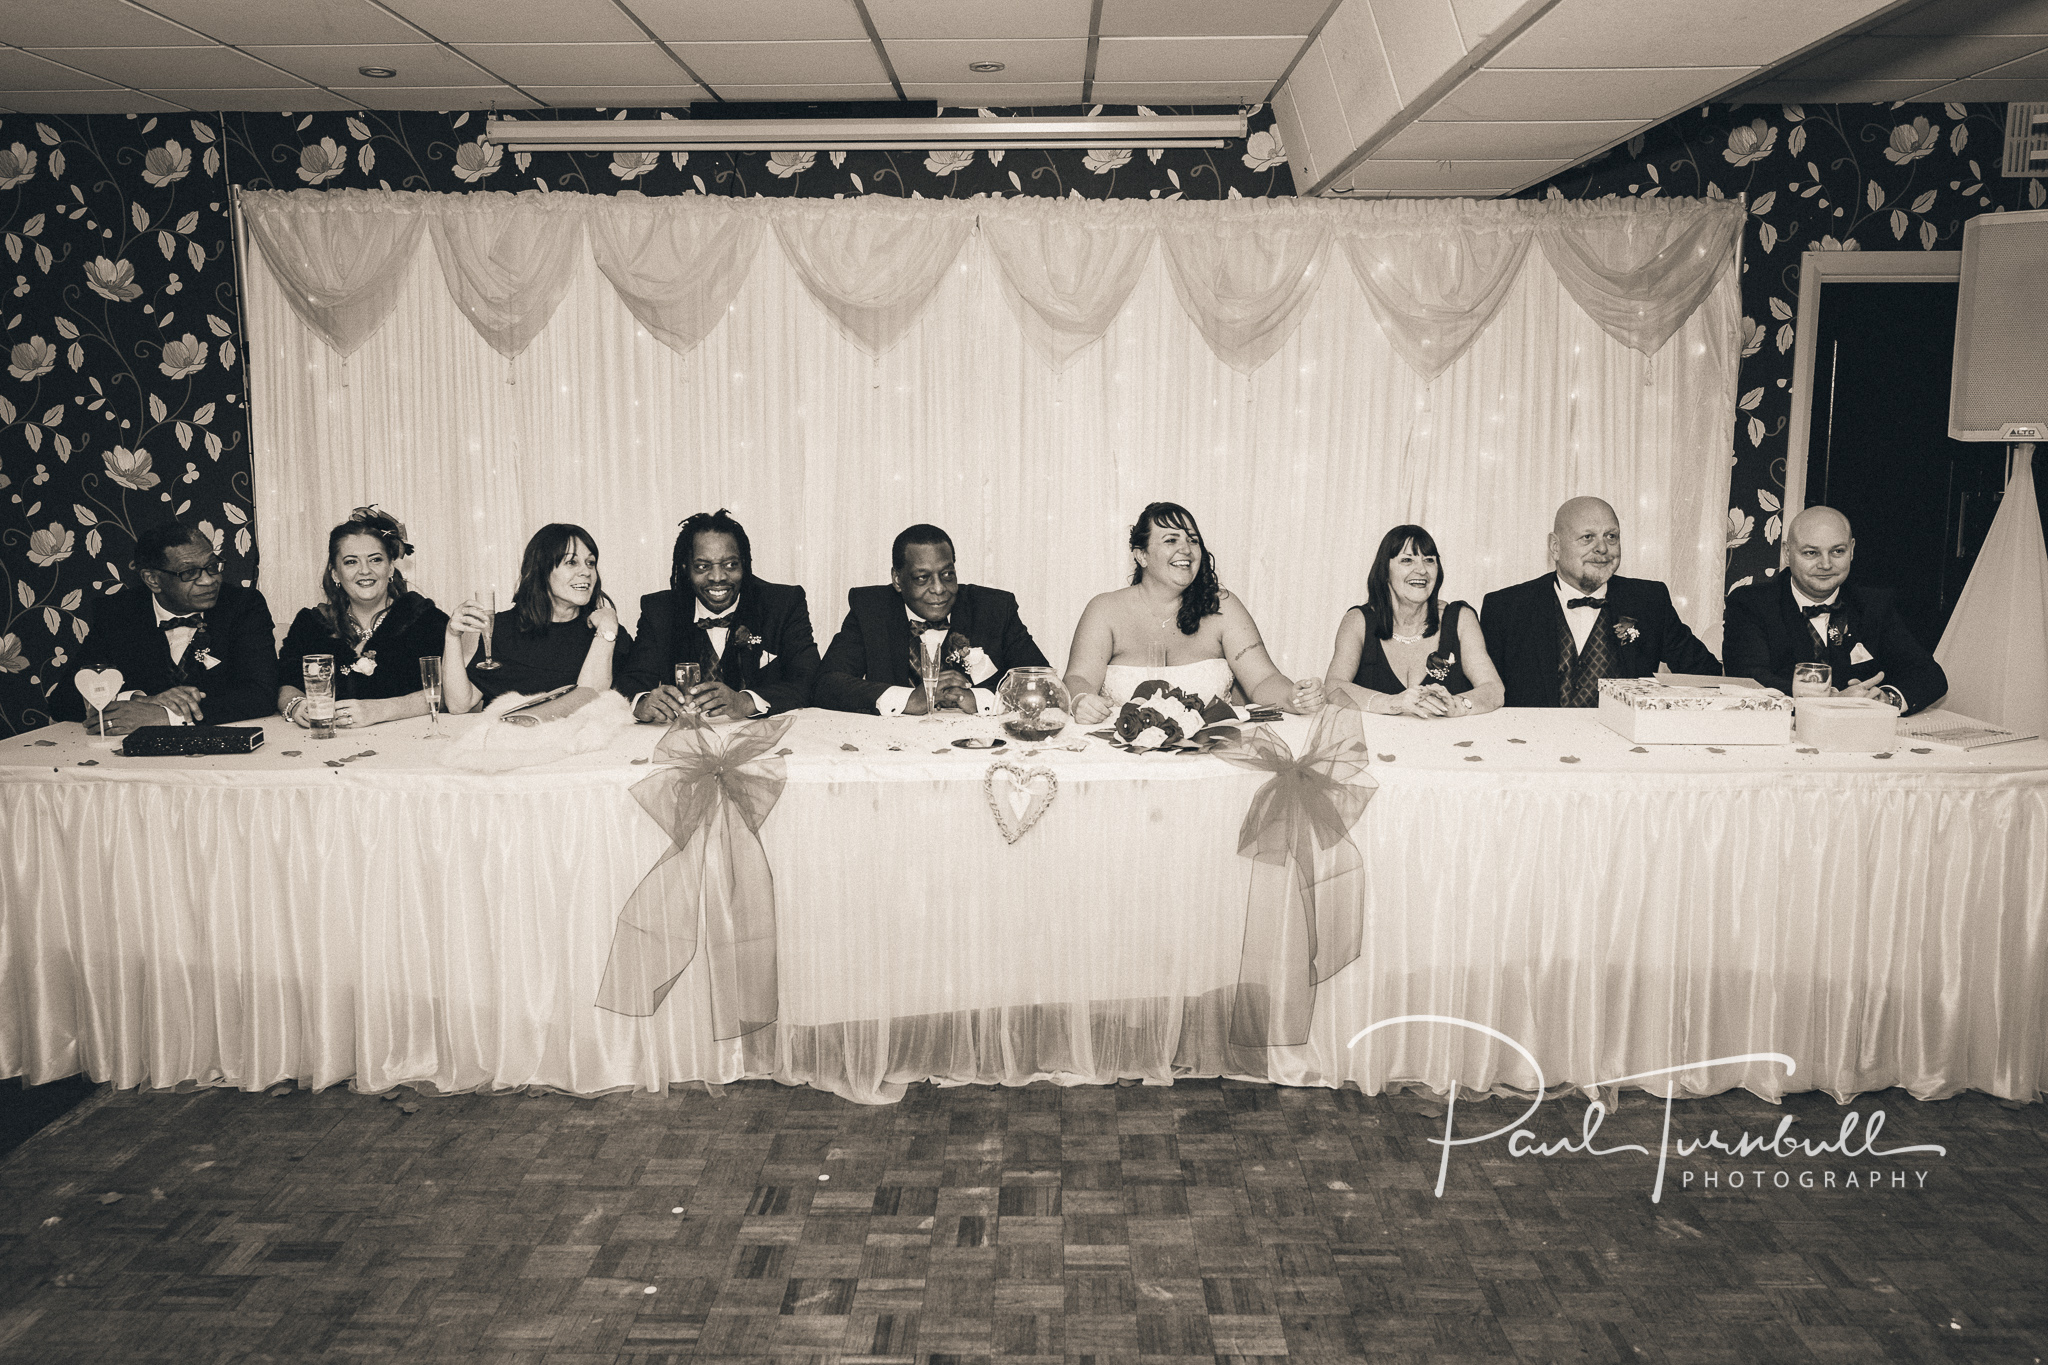 wedding-photographer-leeds-town-hall-038.jpg